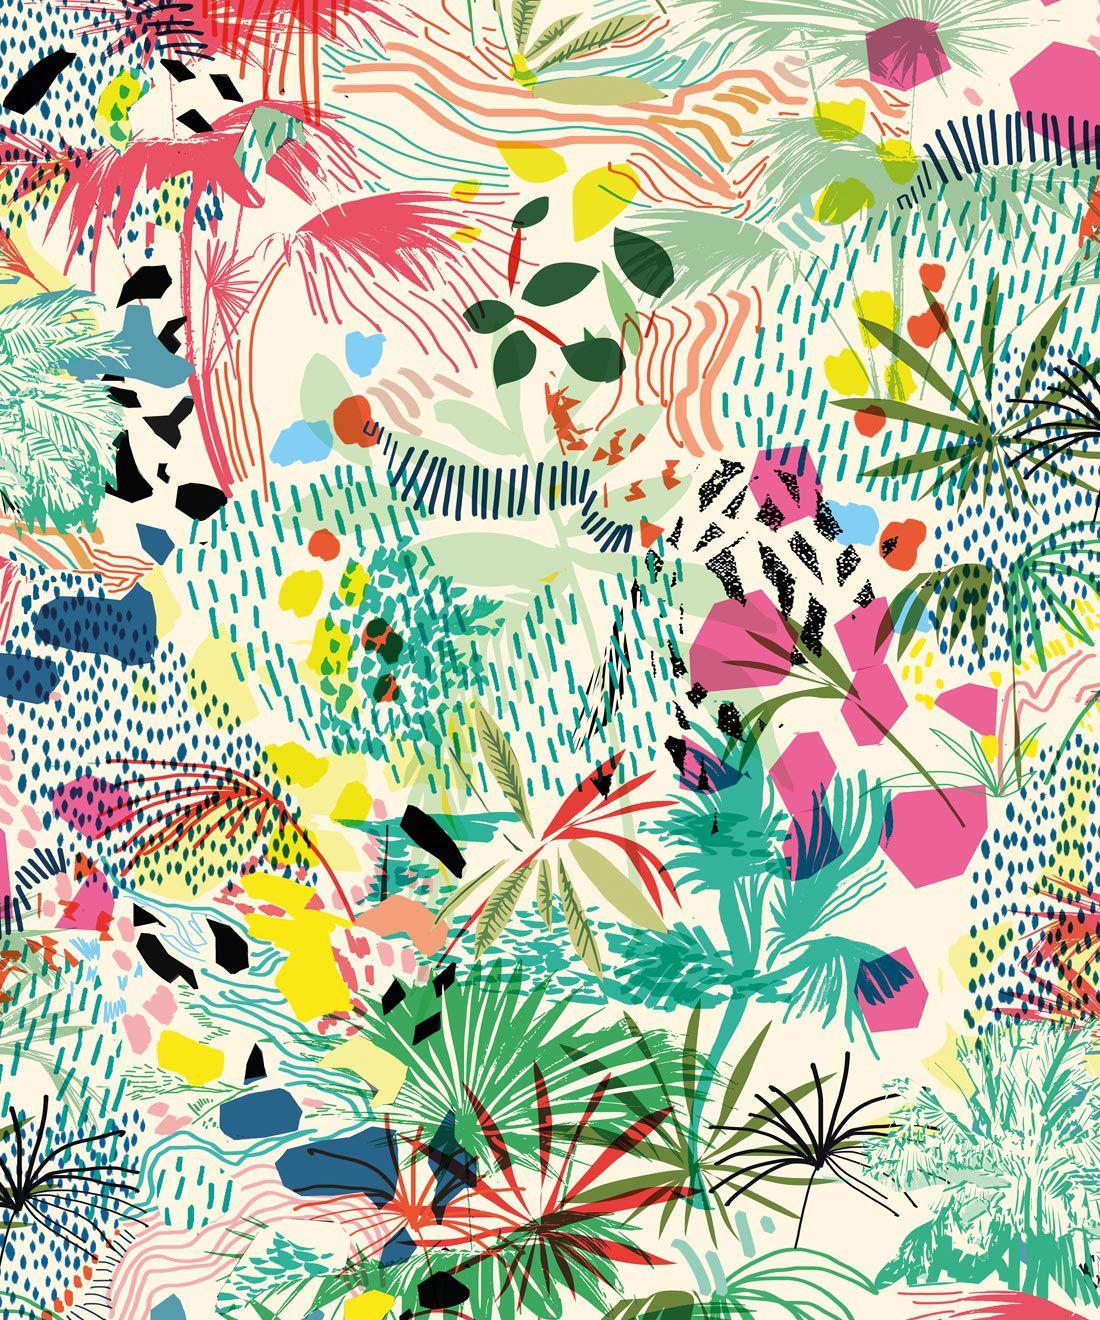 Encinitas Wallpaper • Colourful Floral Wallpaper • Swatch